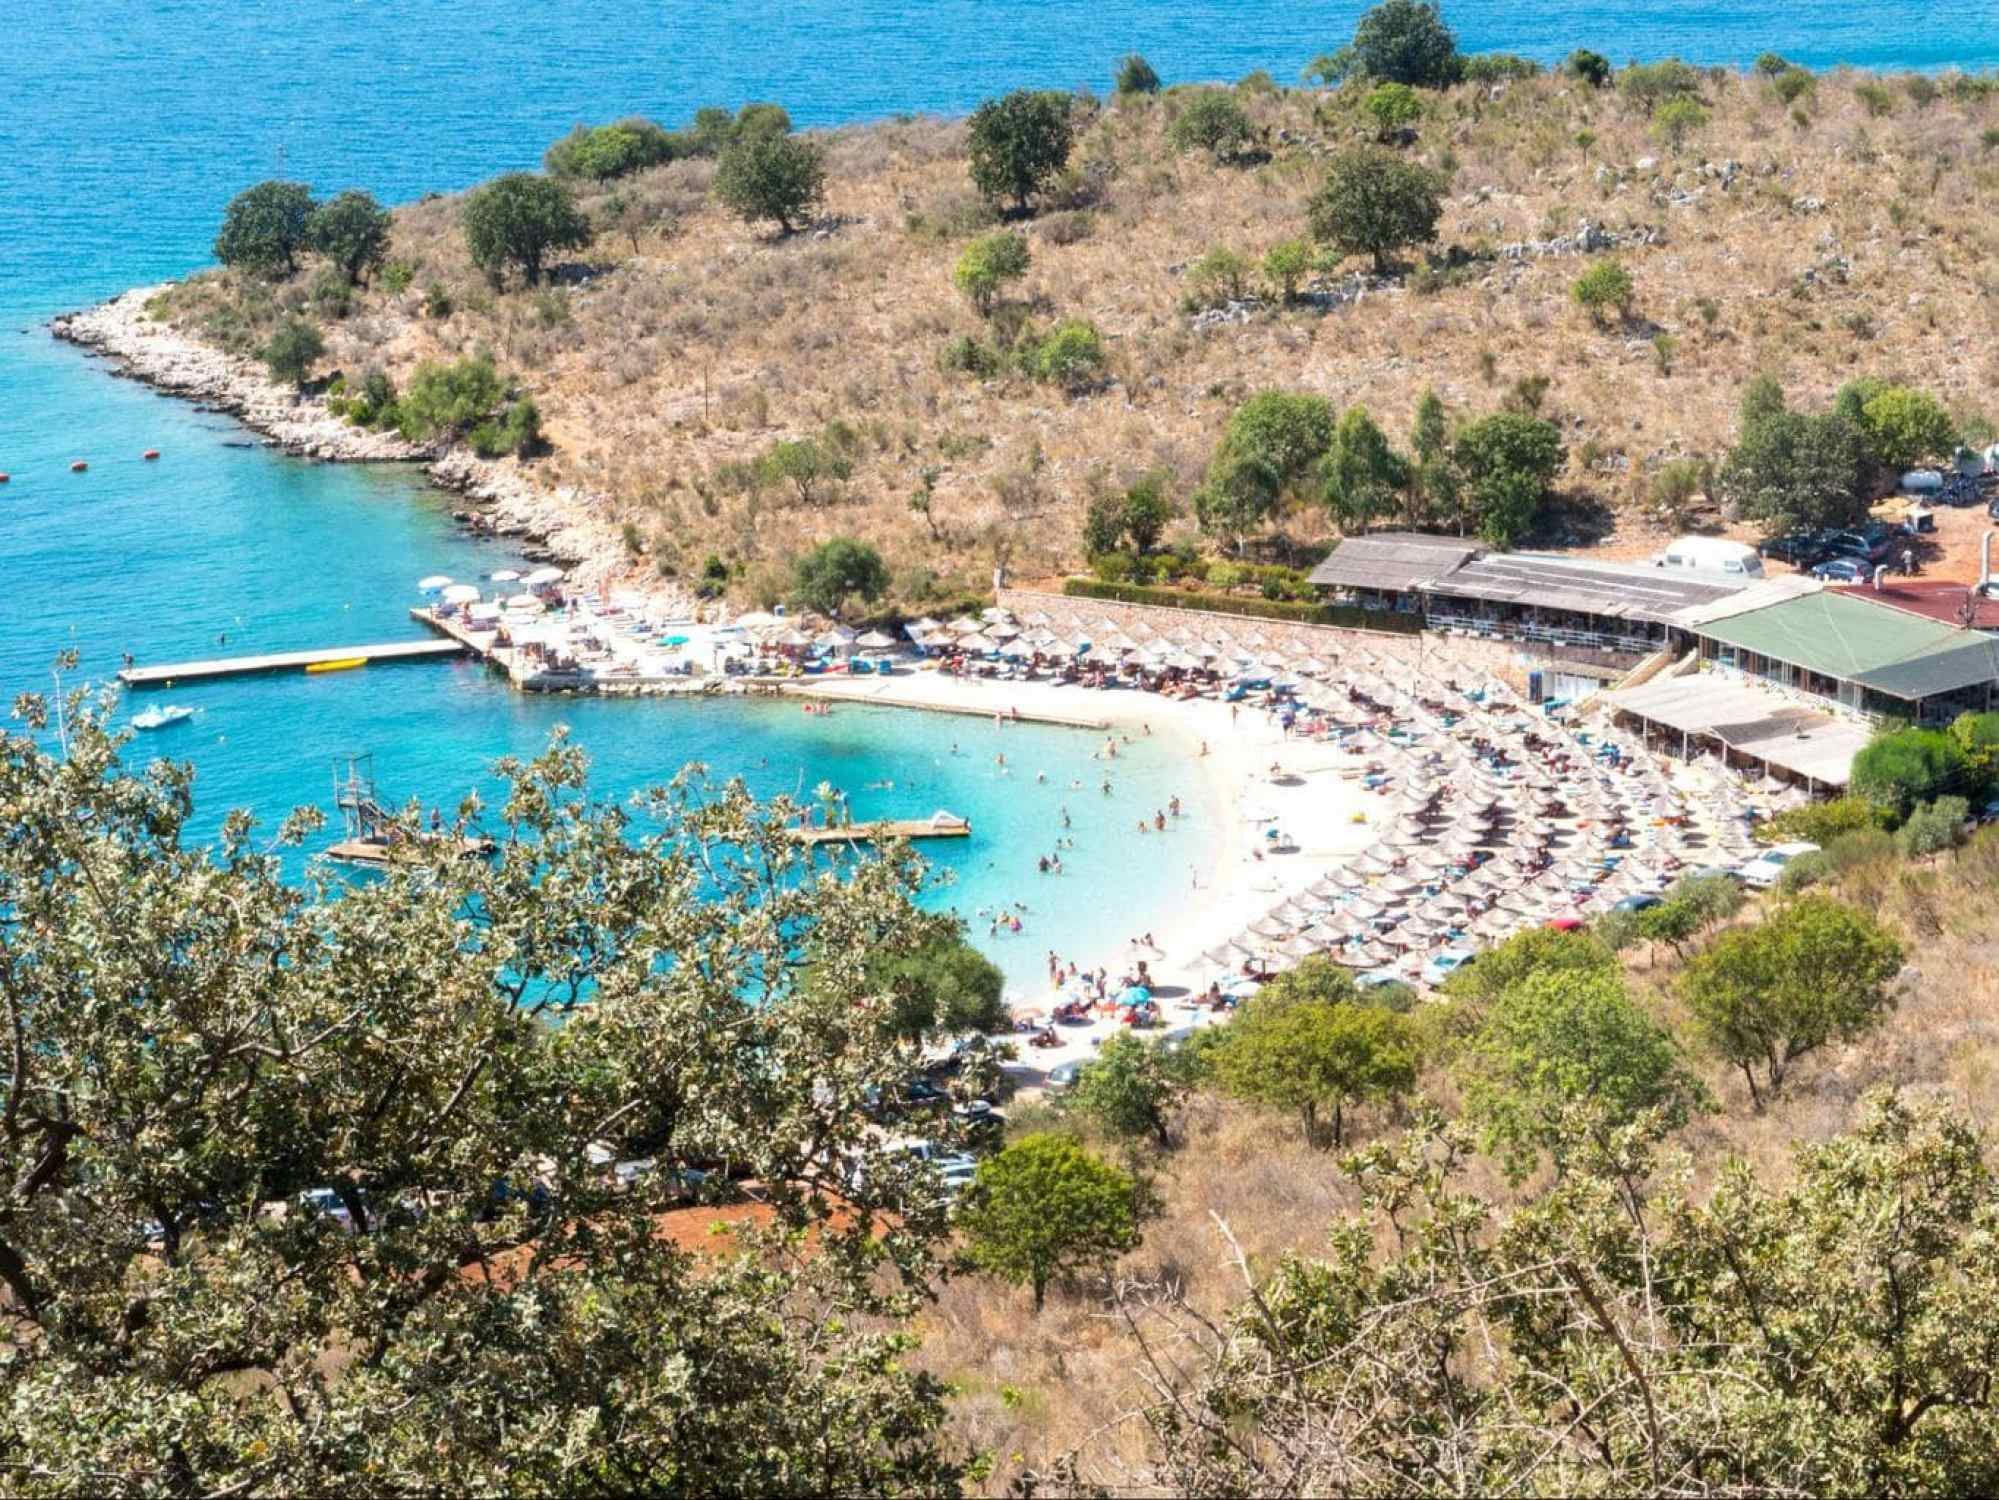 Poda Beach in Albania